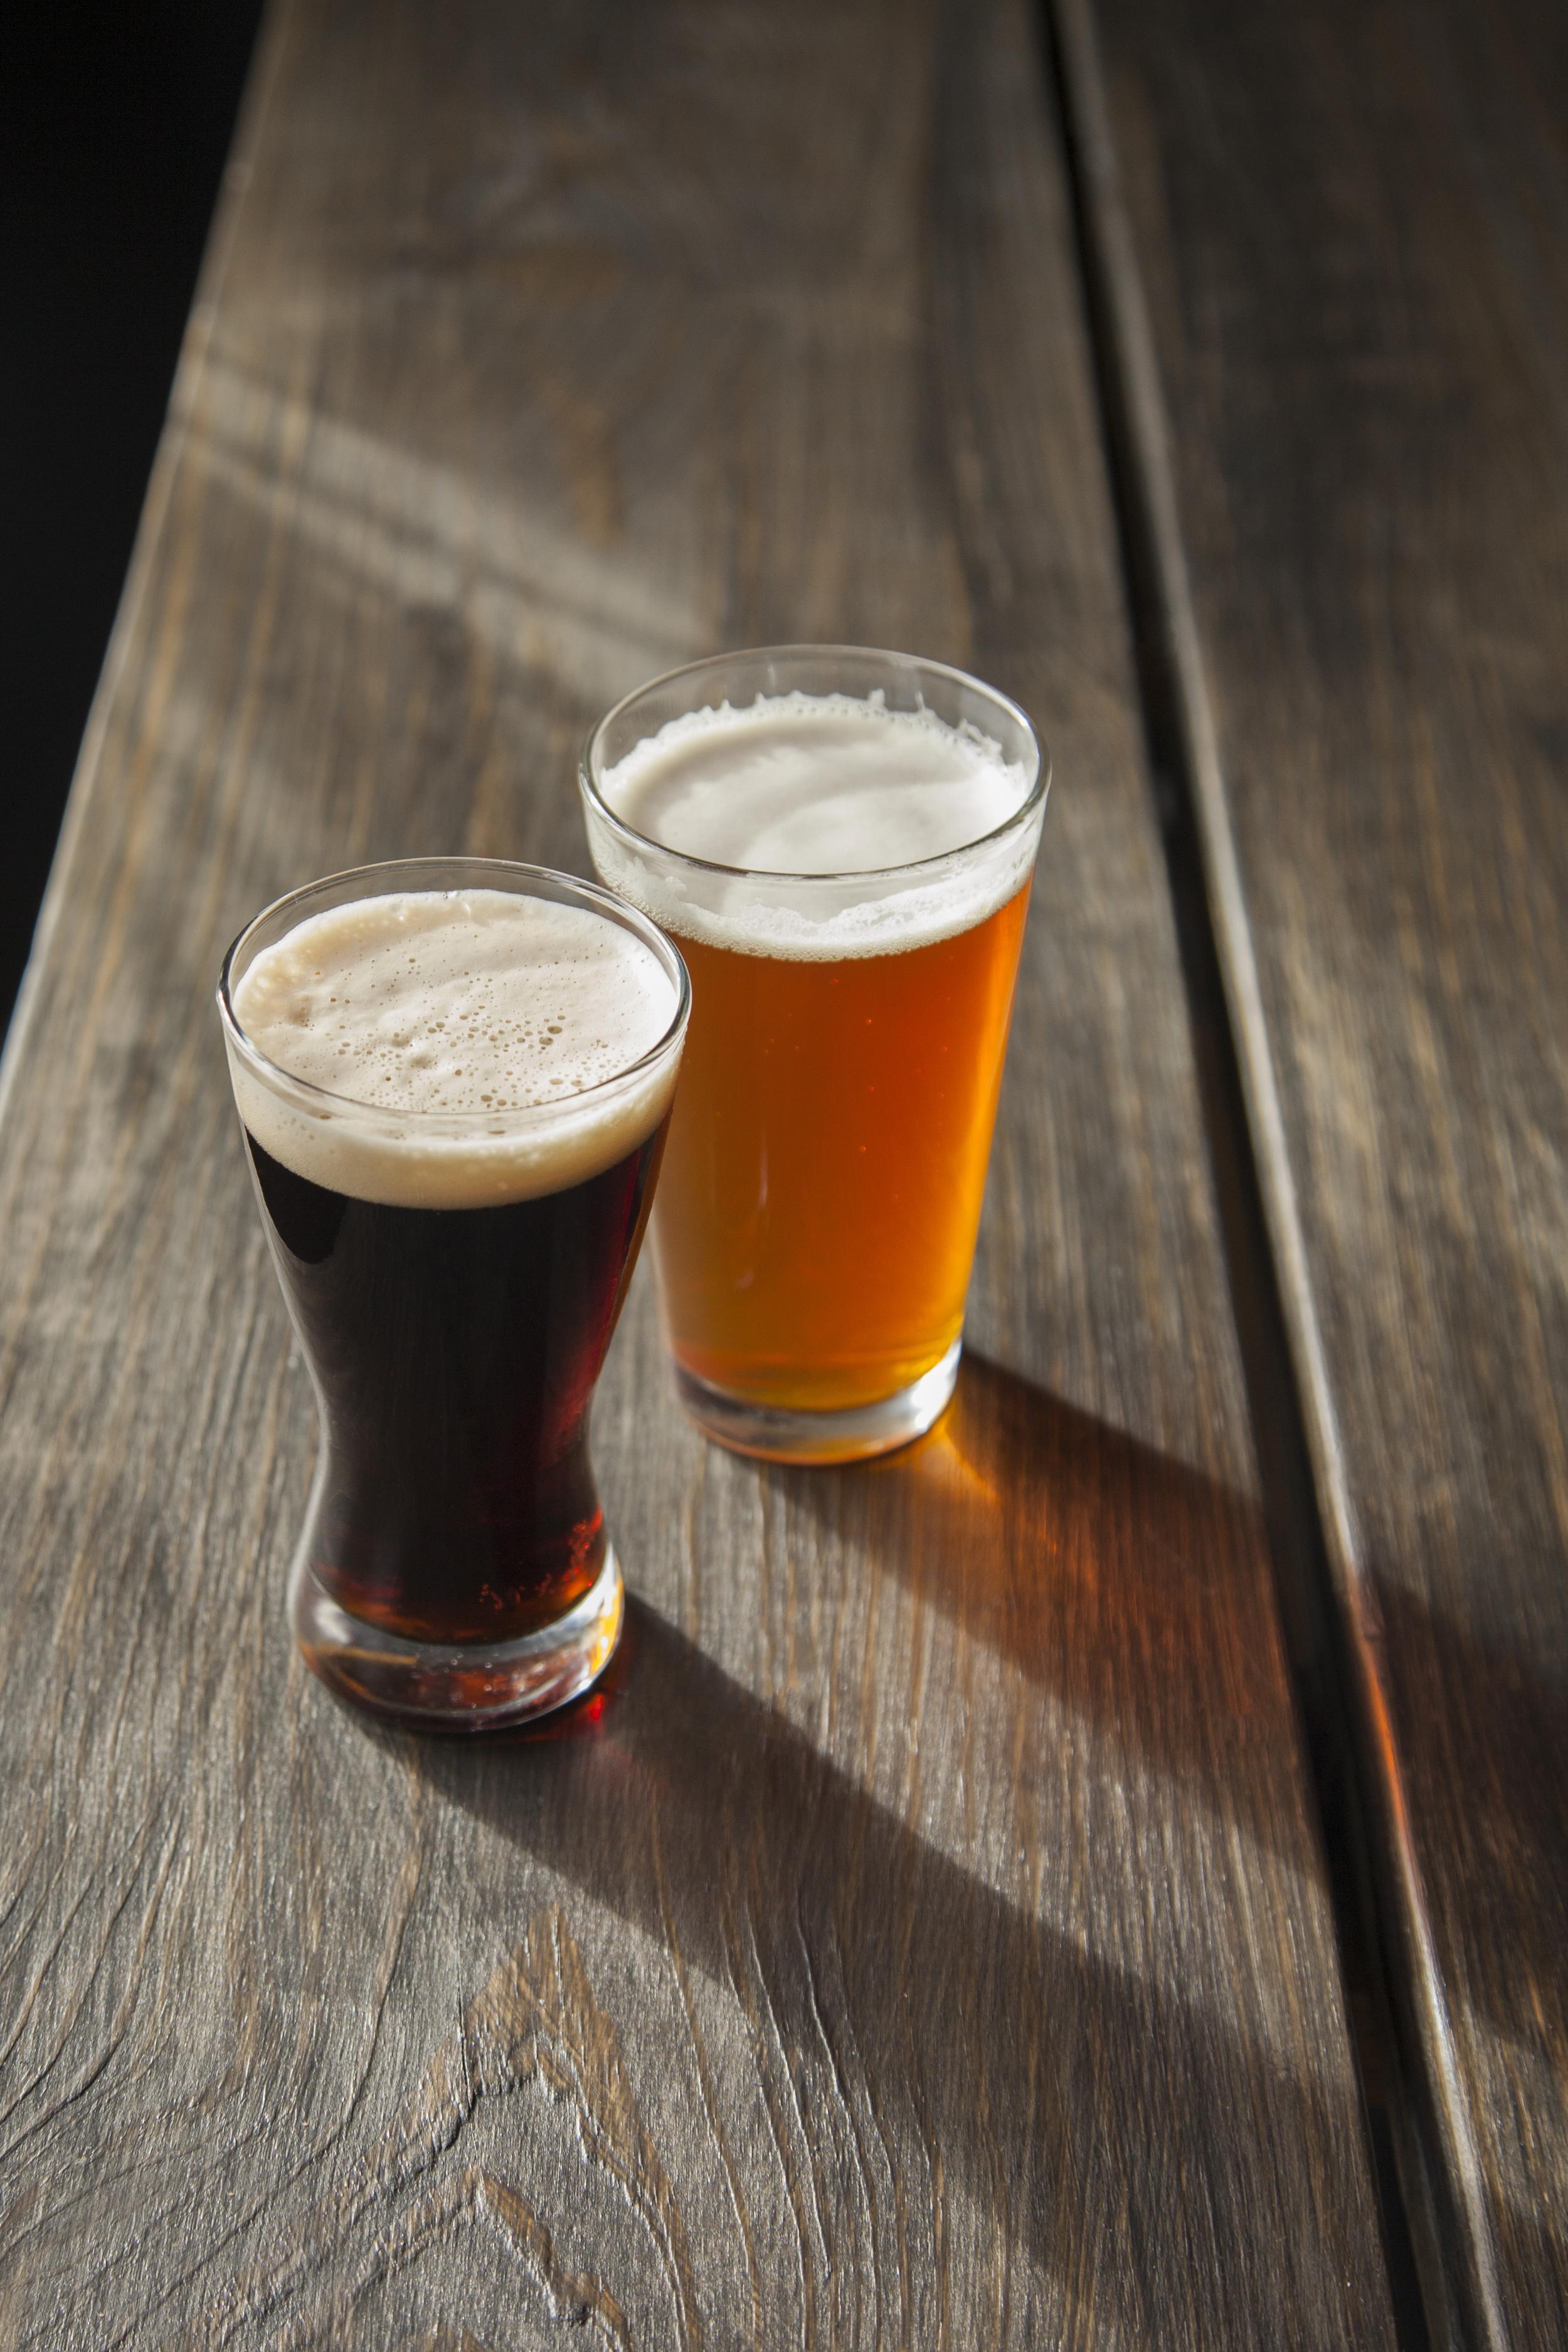 <style> .cincinnati beer photography { display: none } </style>